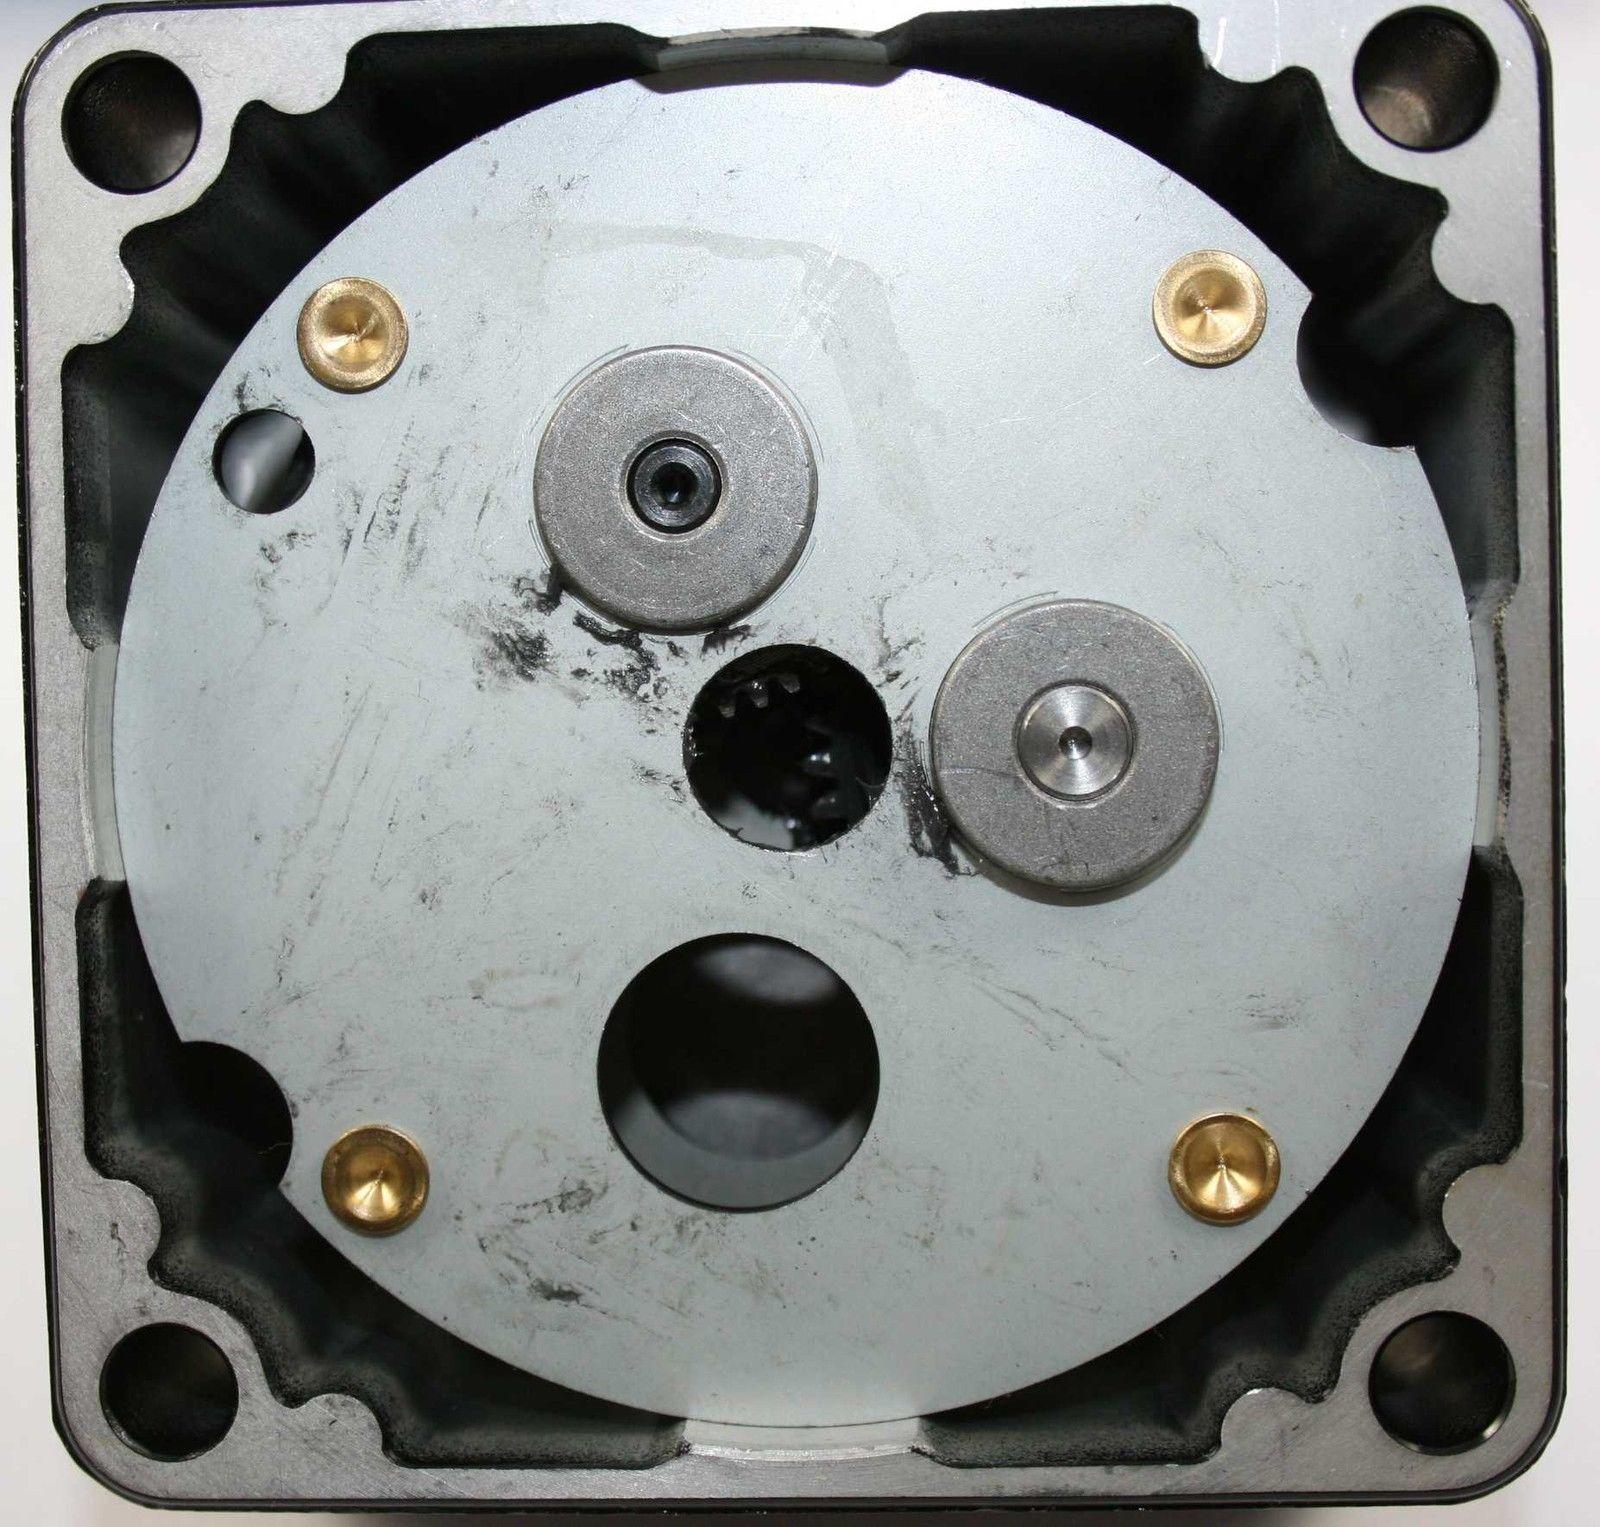 NEMA17 0.63A//68oz-in Stepper Motor with Belt Pulley 28M101